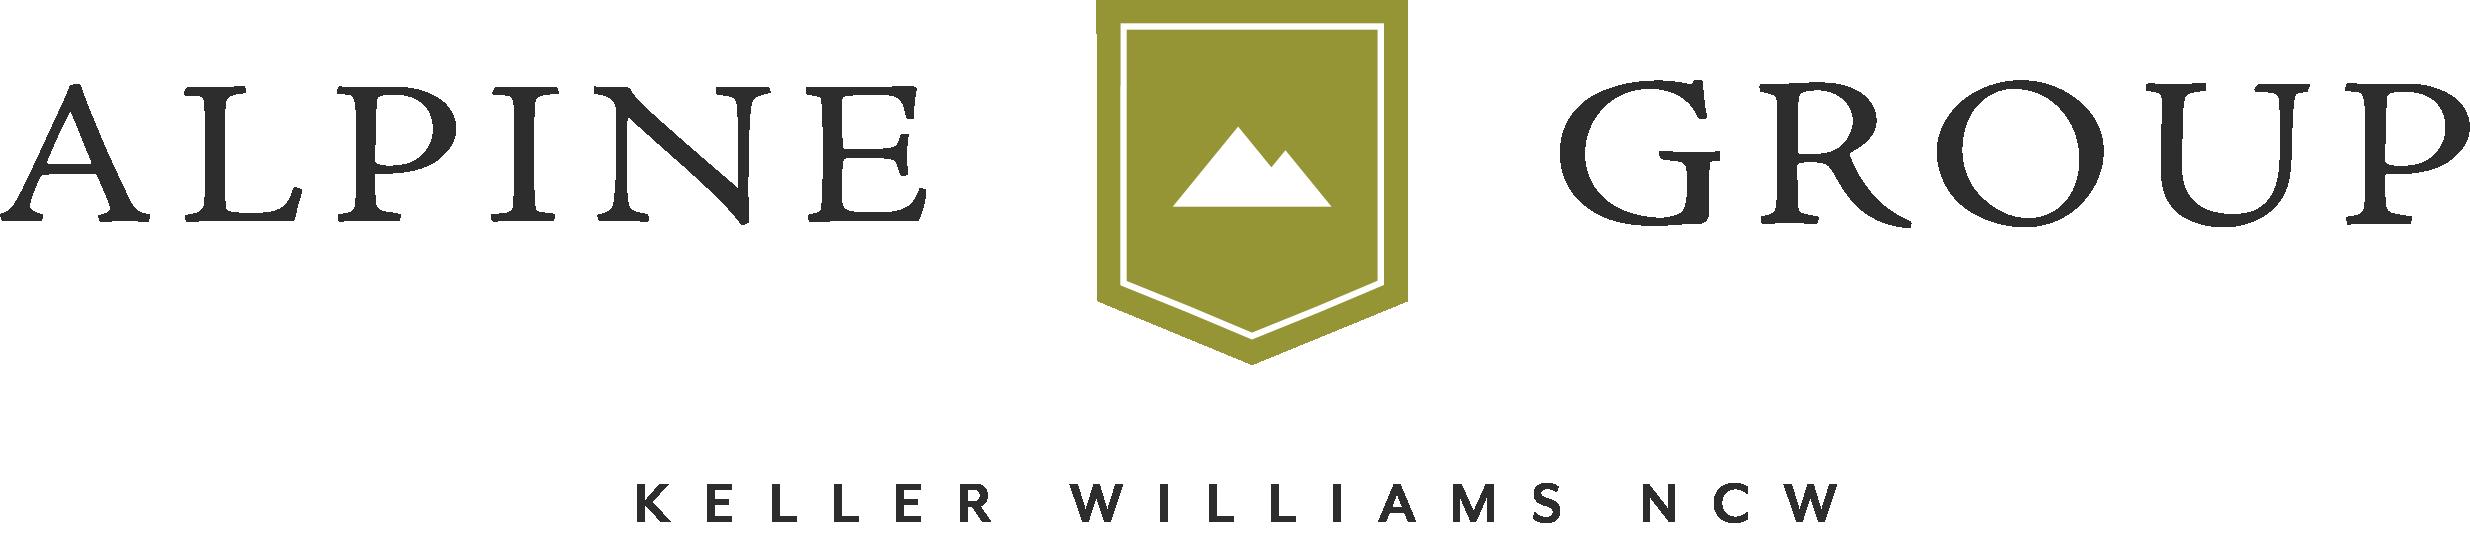 Keller Williams - Alpine Group